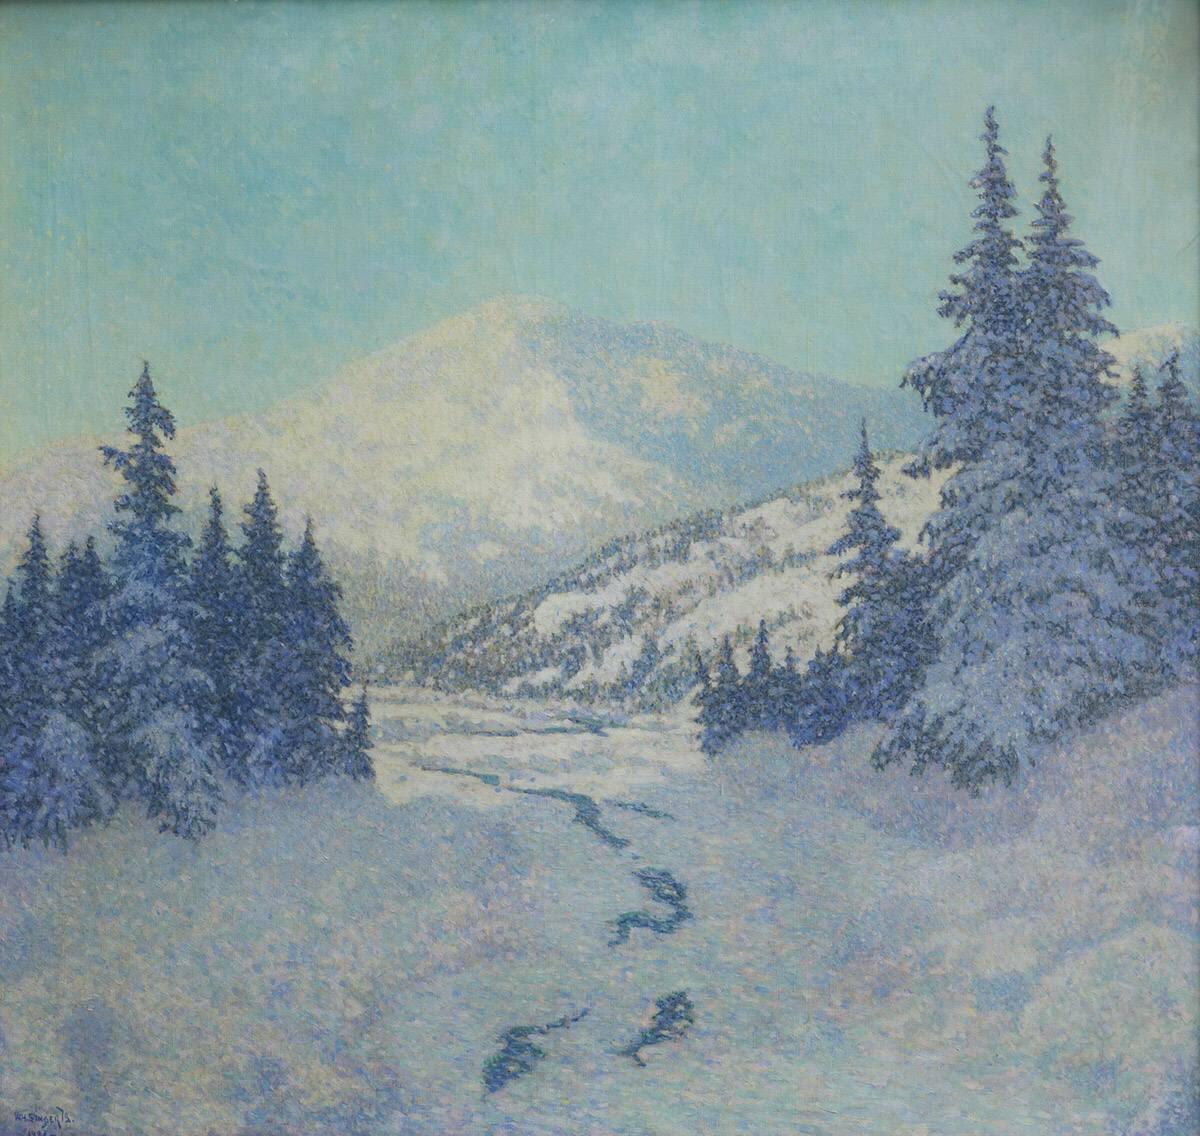 Zugefrorener Fluss (The Frozen River)